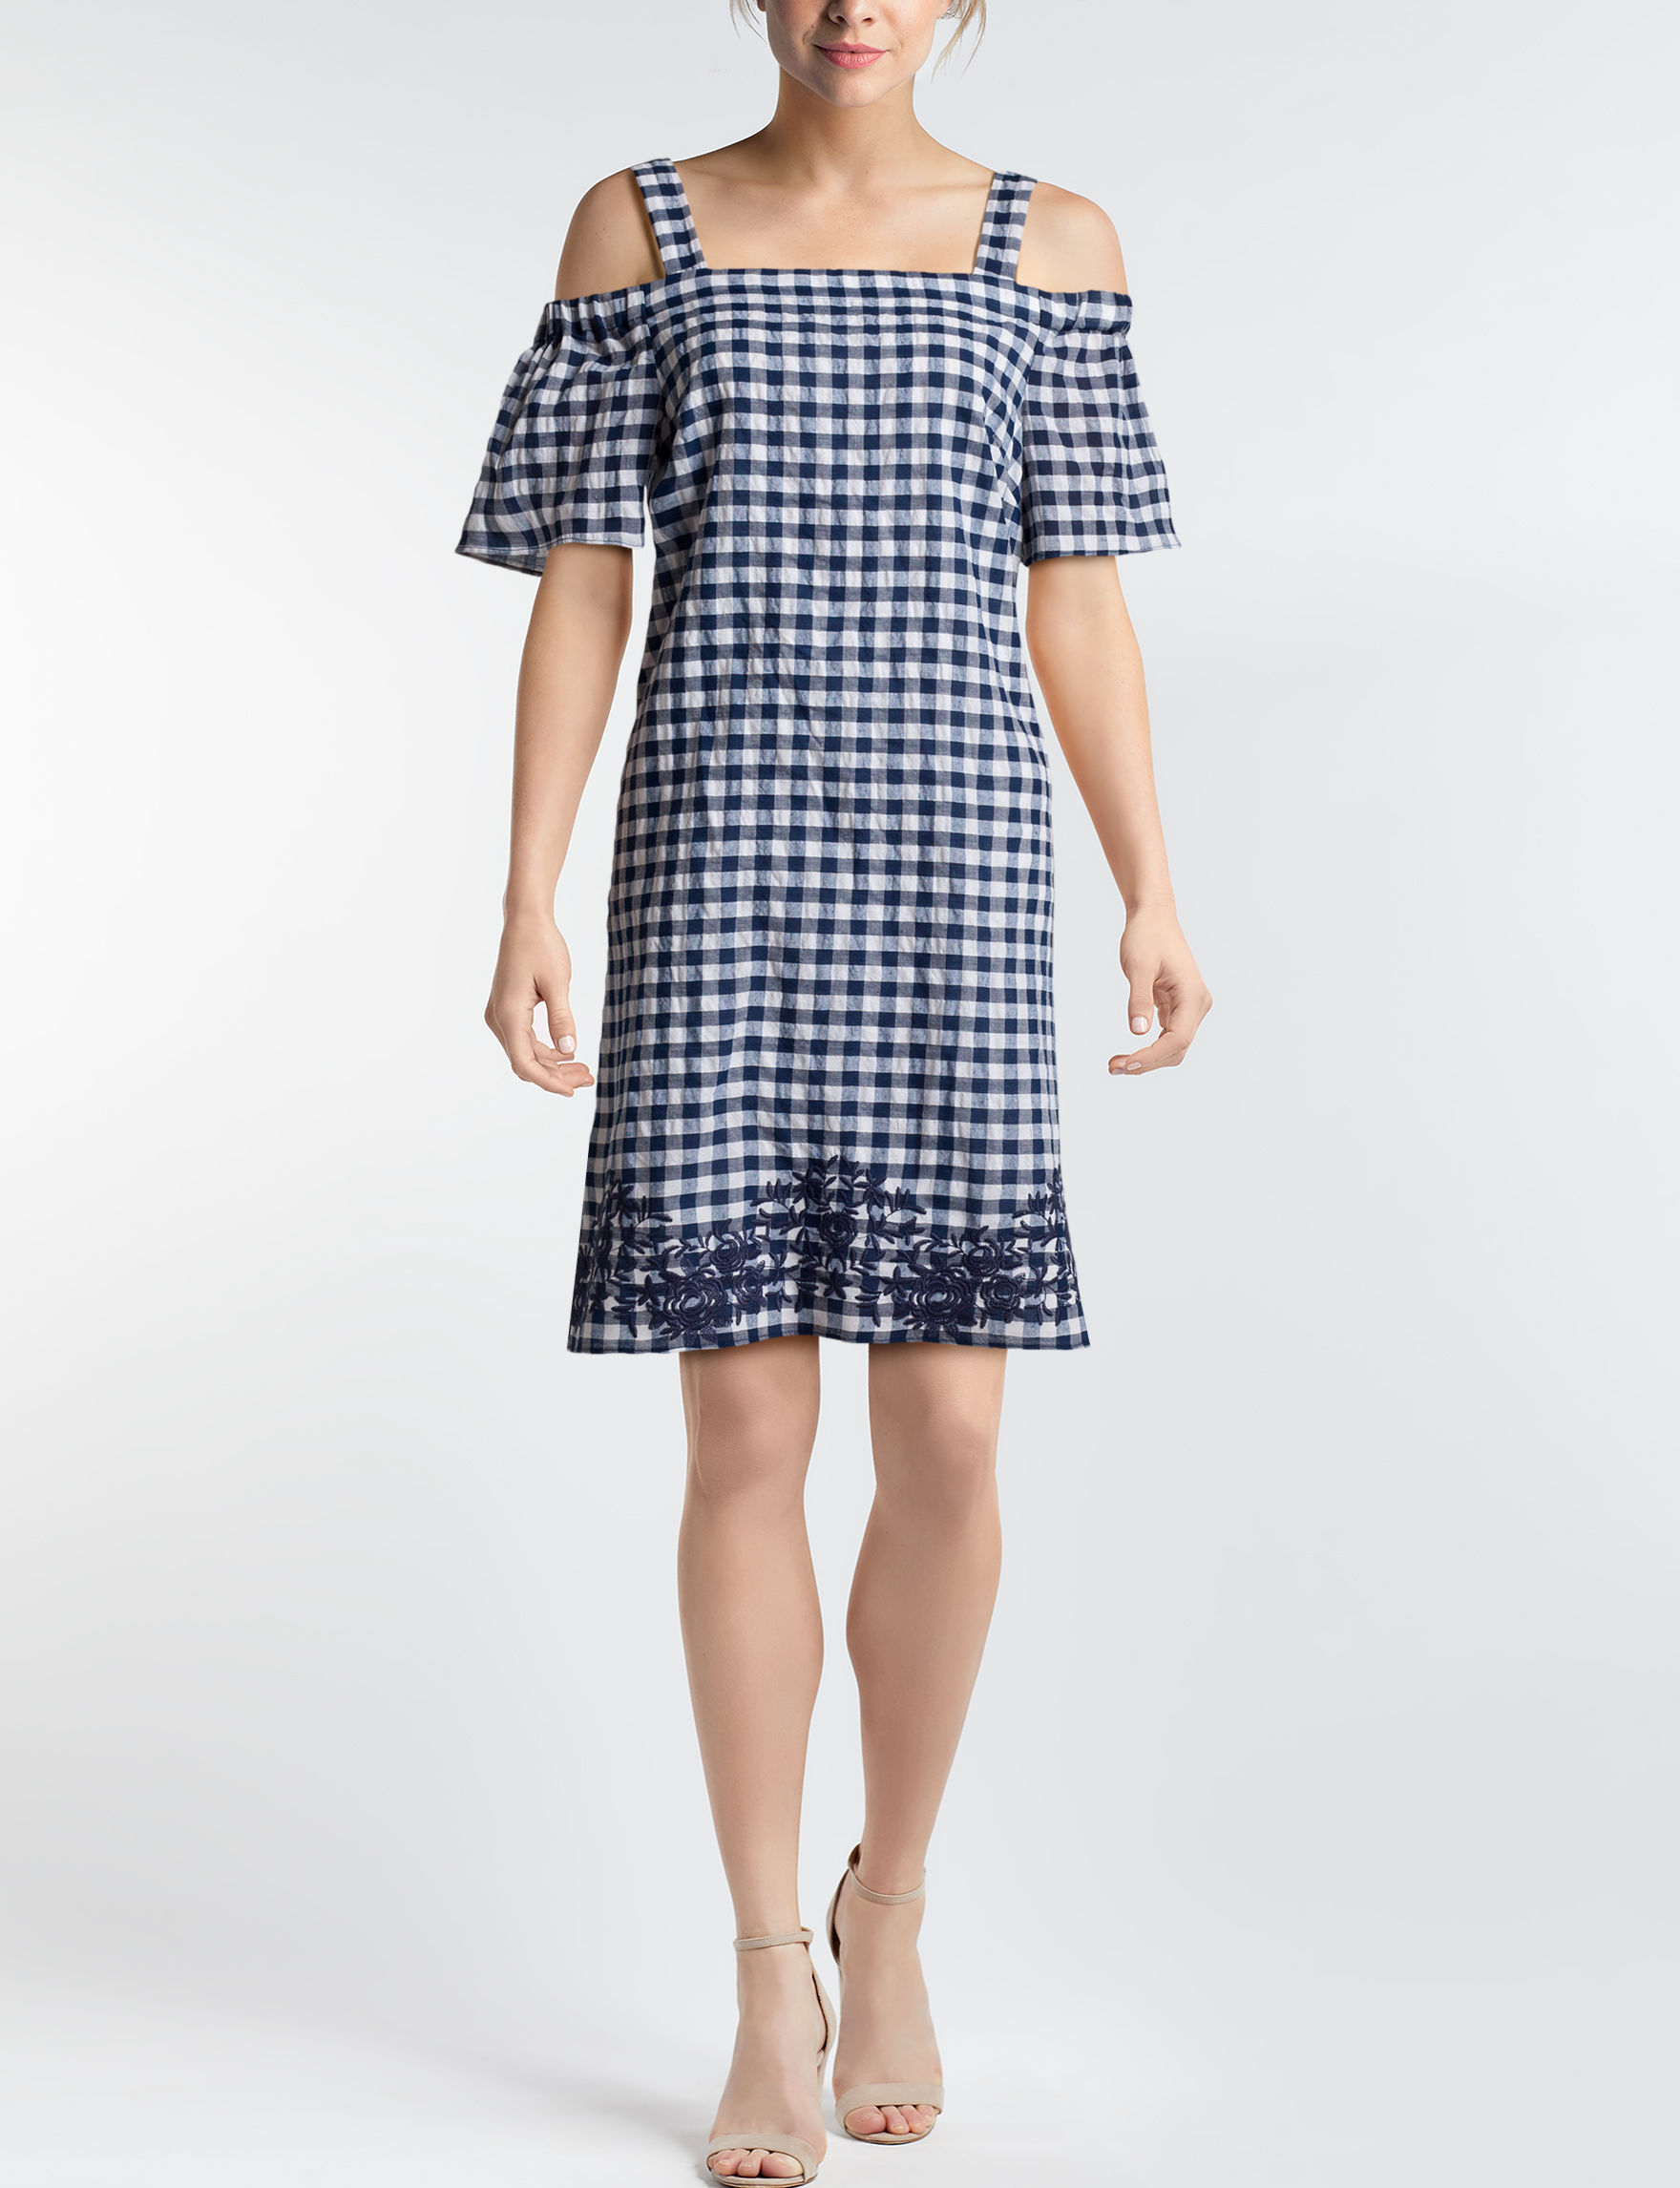 Nine West Navy / White Everyday & Casual A-line Dresses Sundresses